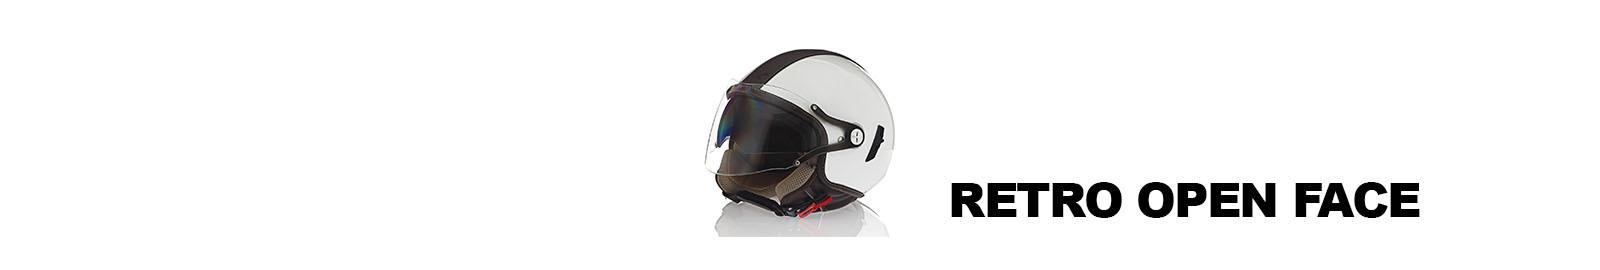 Nexx SX60 Helmets